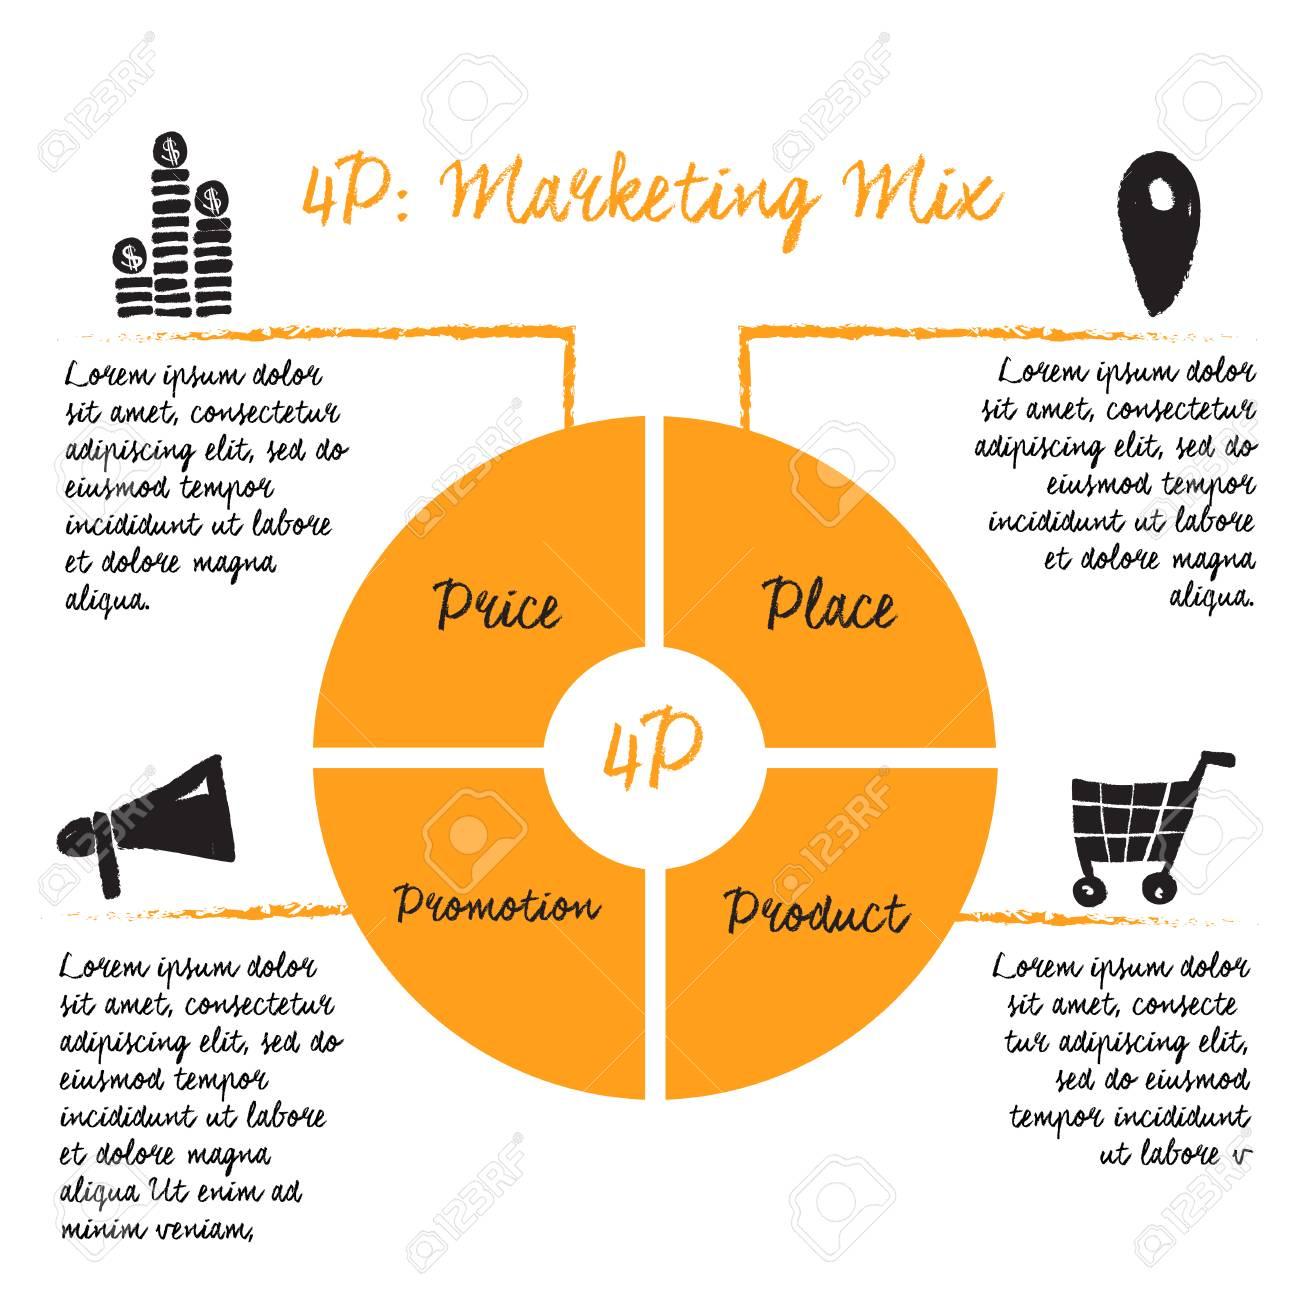 4ps of marketing explain